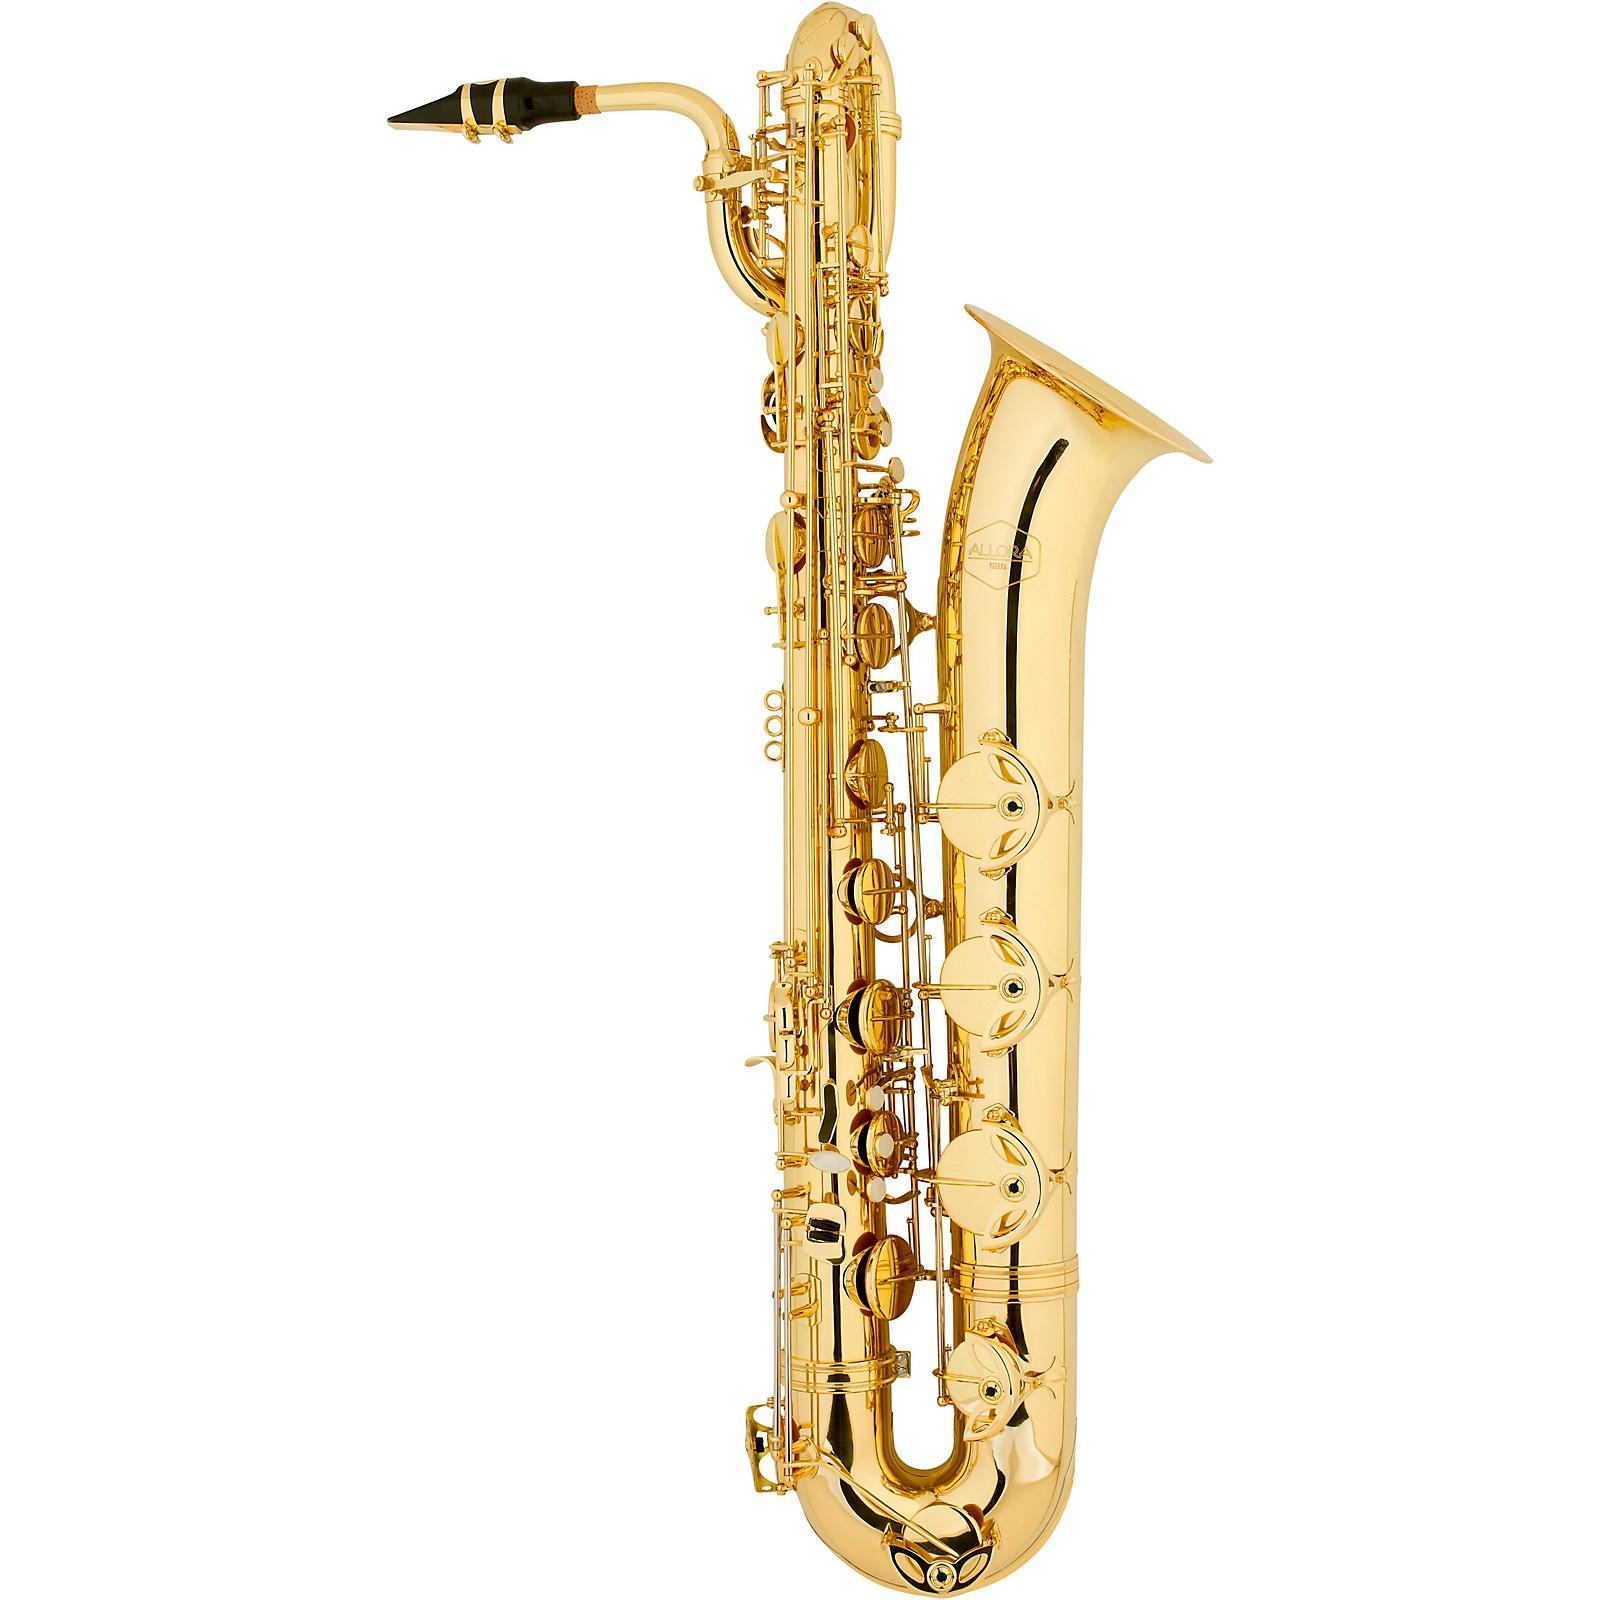 Allora ABS-450 Vienna Series Baritone Saxophone